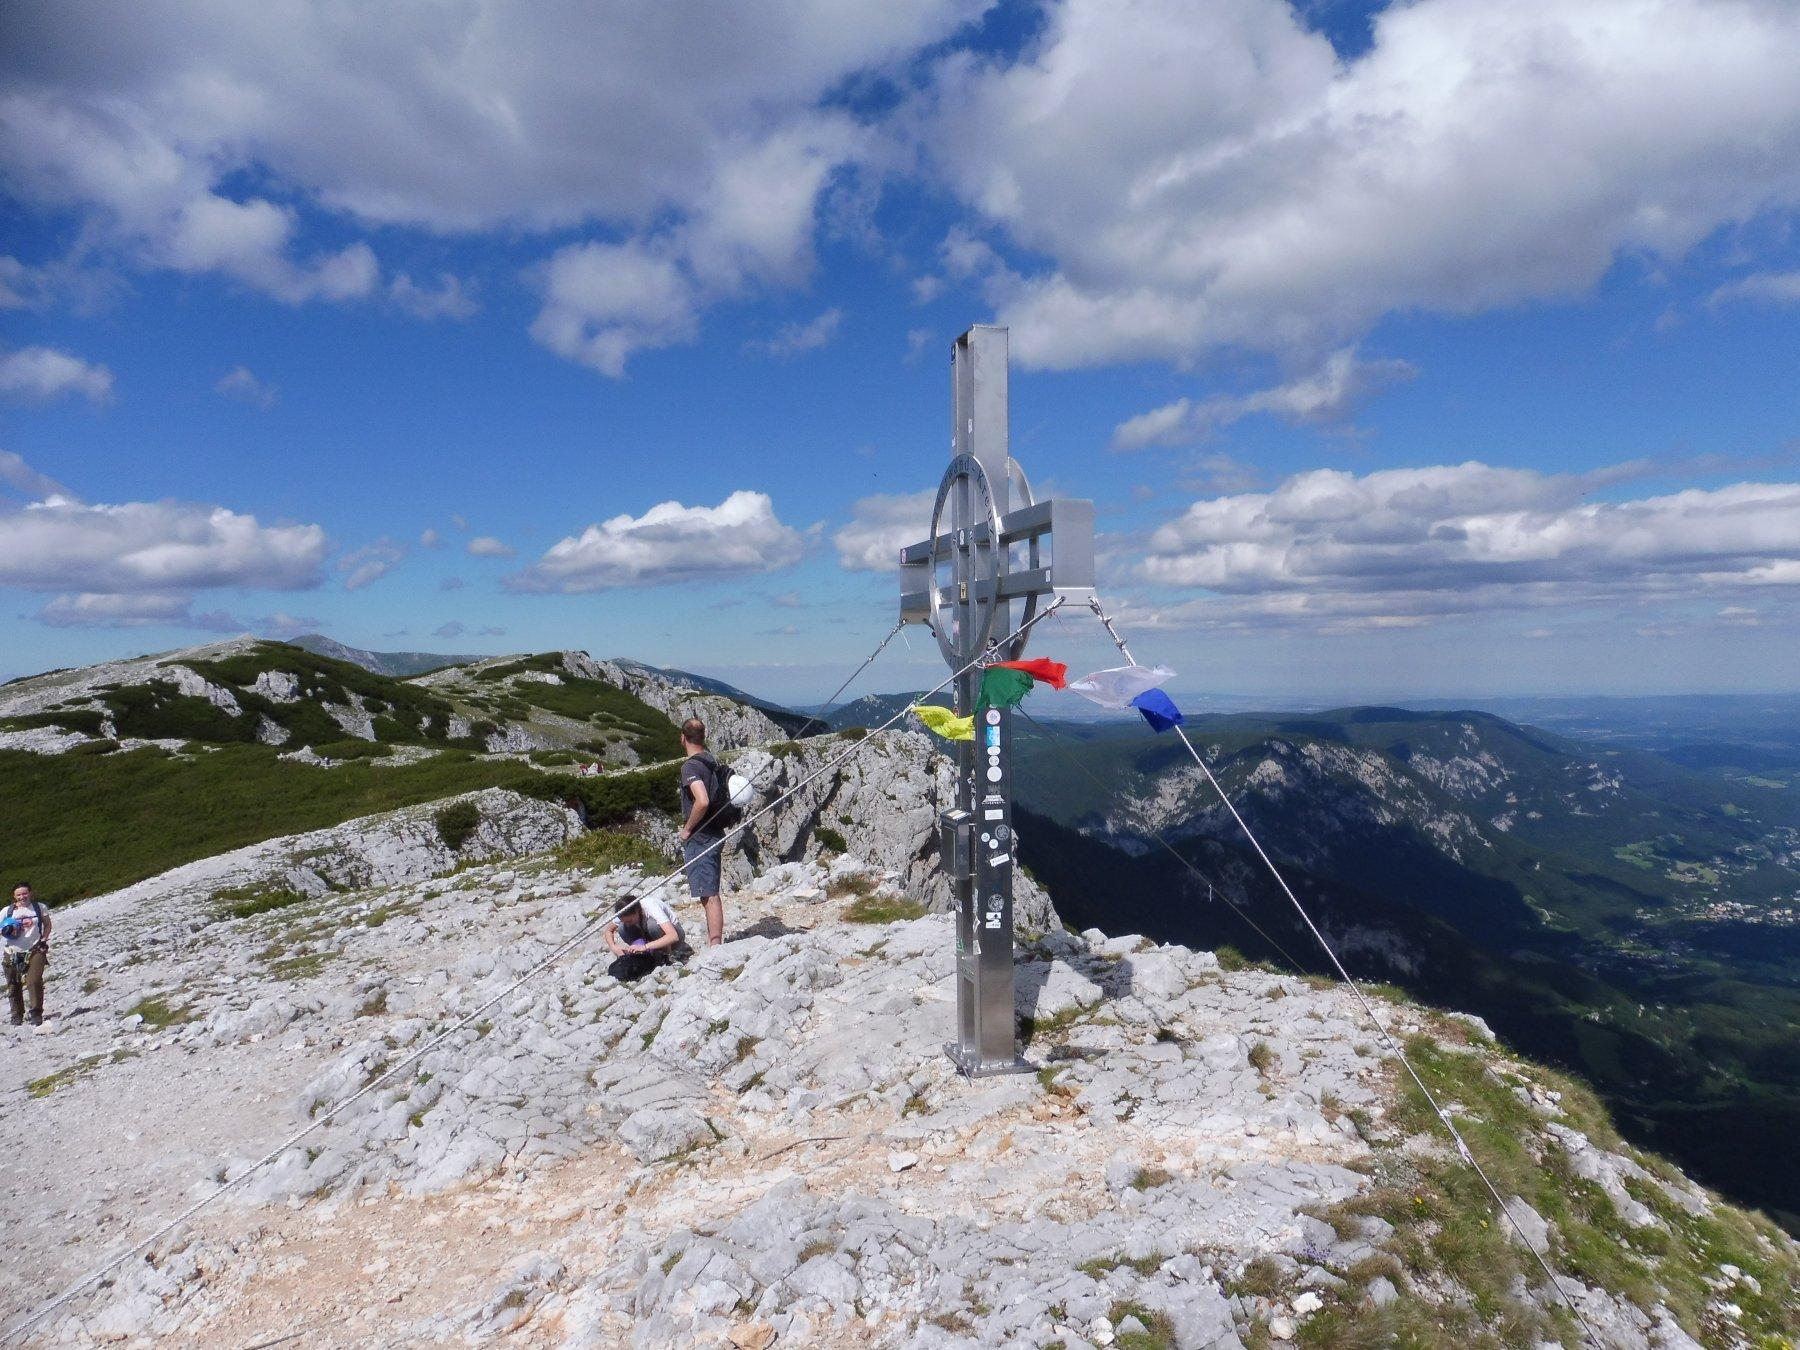 Rax (altopiano) da Kaiserbrunn 2020-07-05